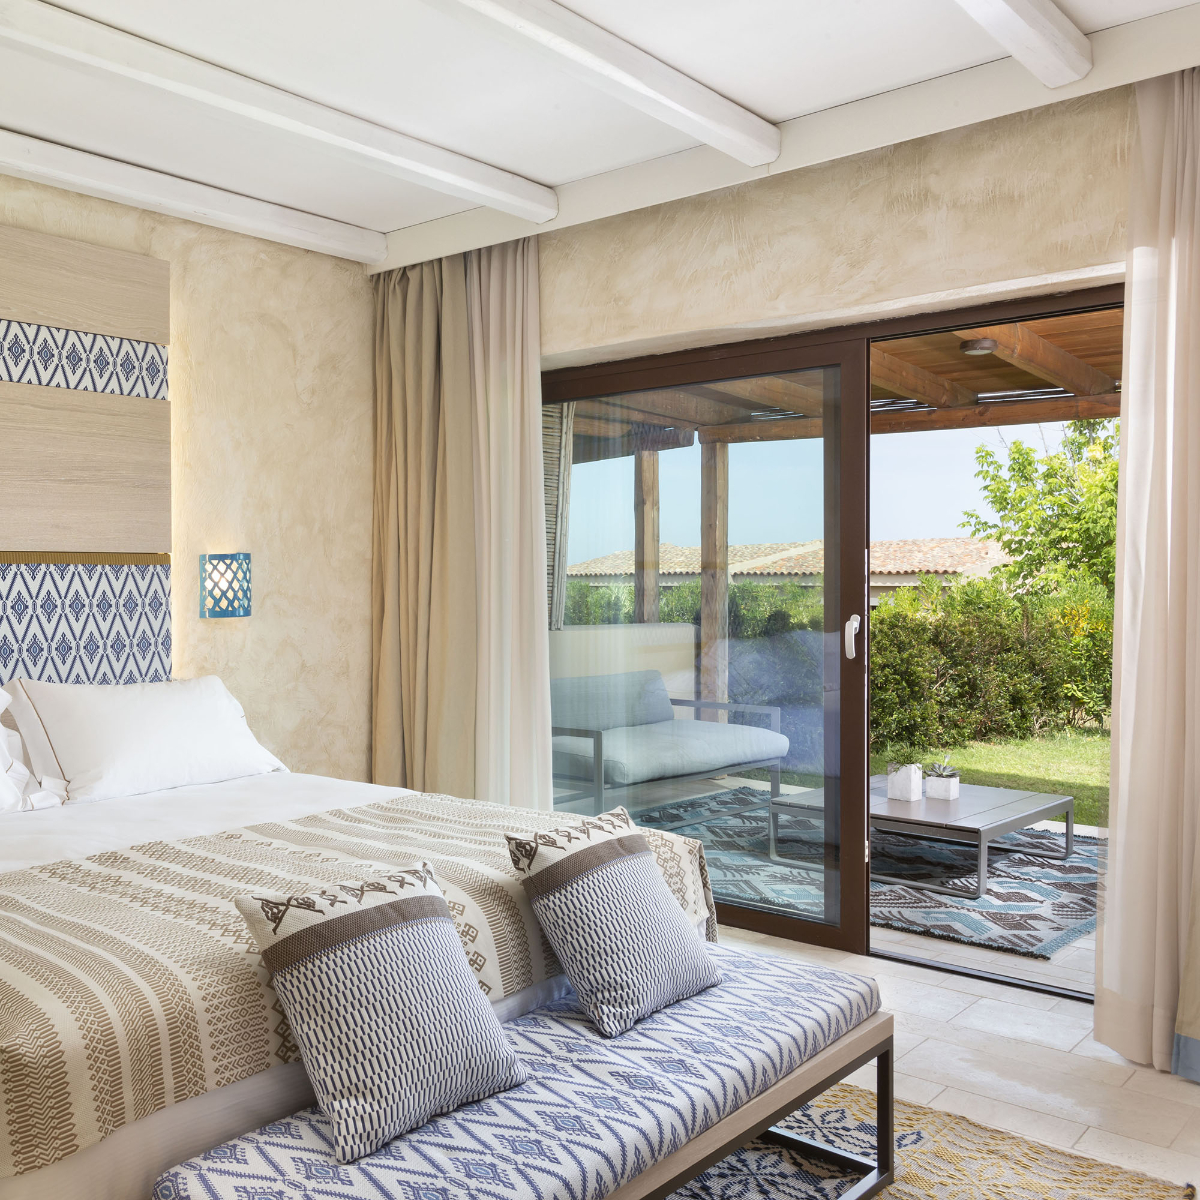 Baglioni Resort Sardinien (34)